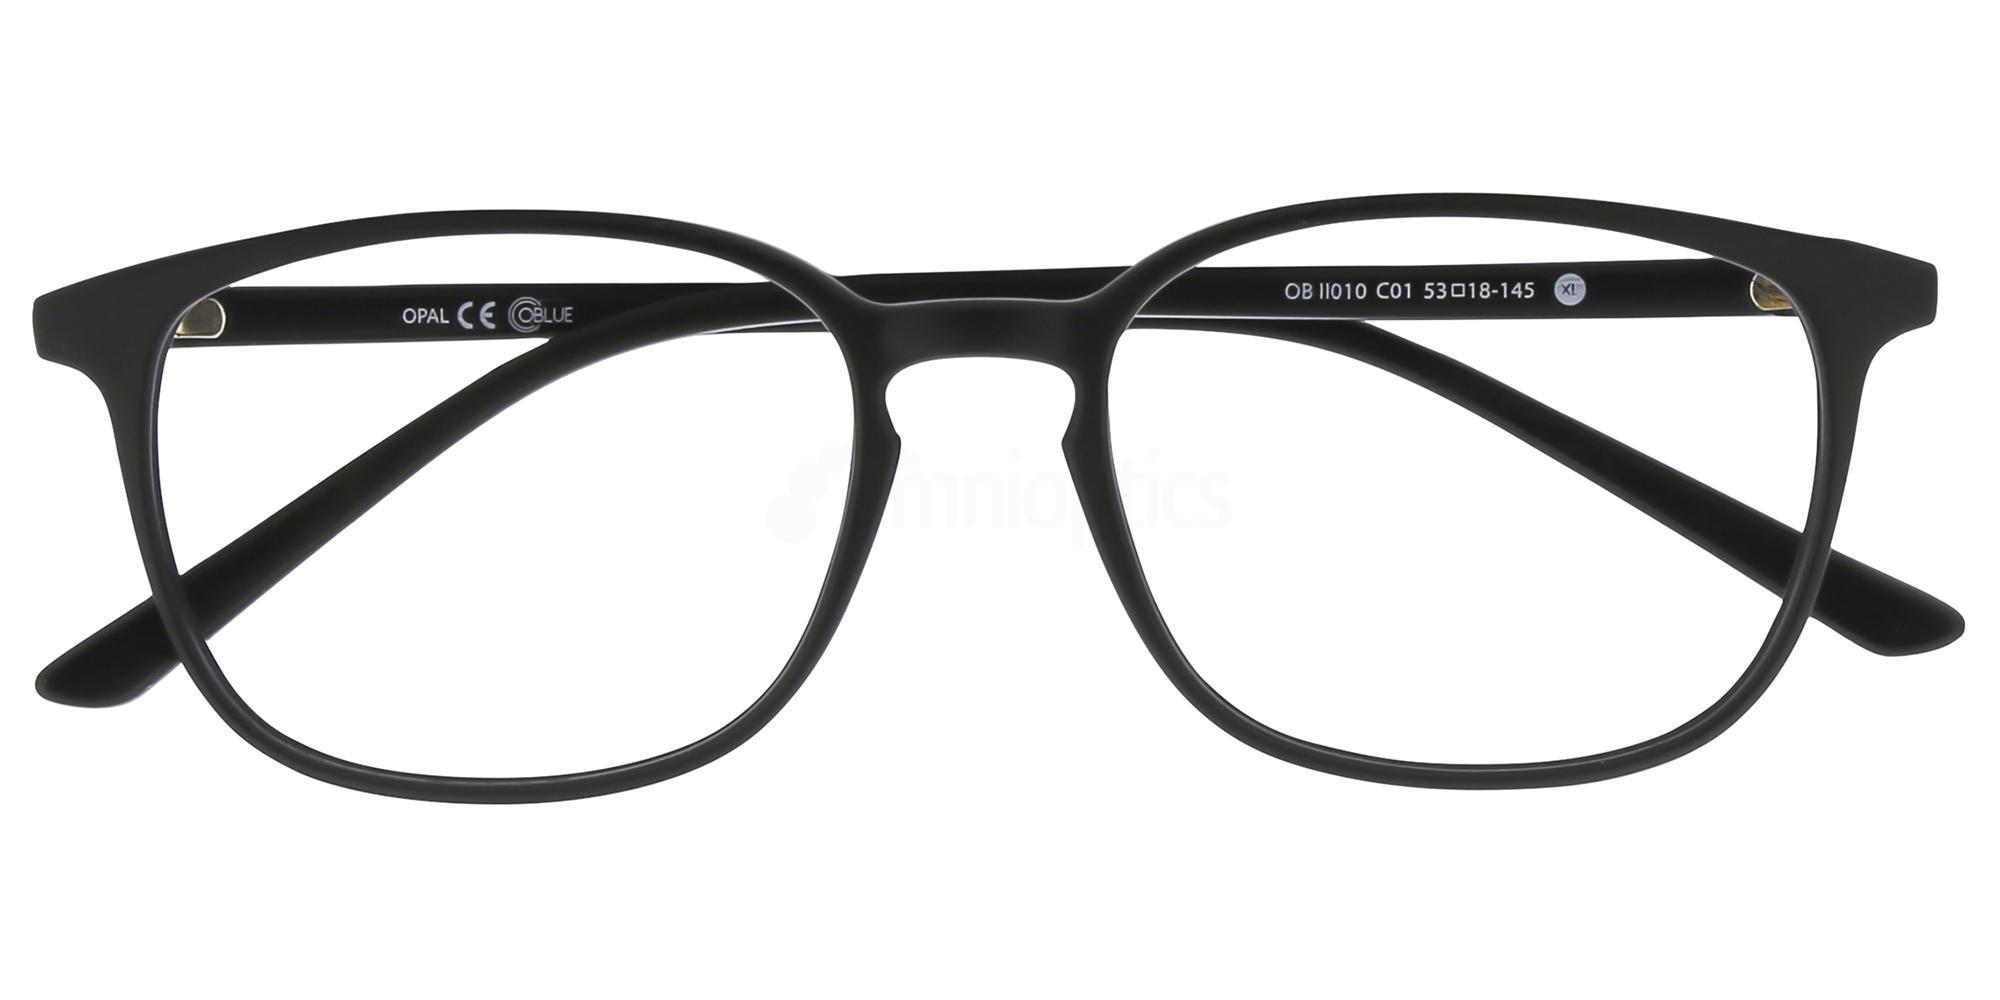 C01 OBII010XL Glasses, Oblue